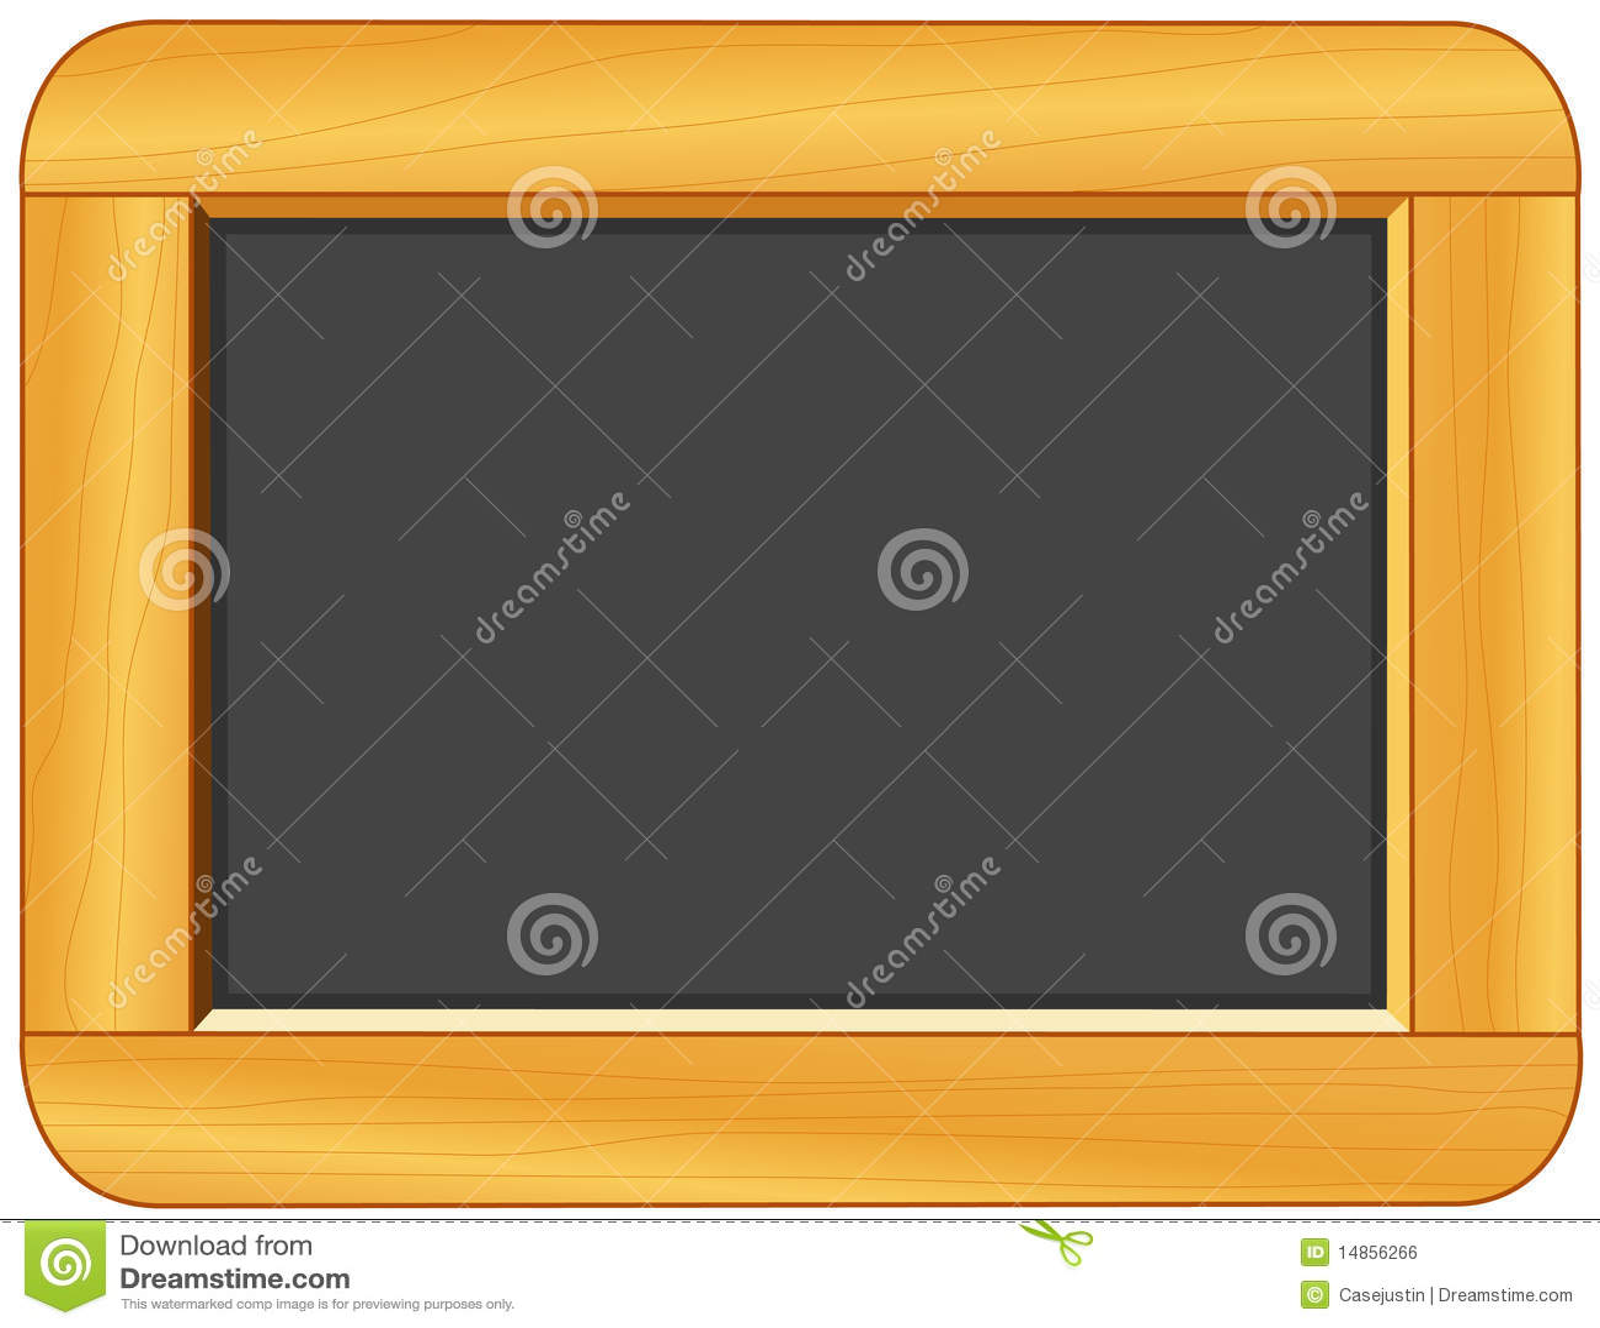 Chalkboard, Blank Slate, Add Your Own Text